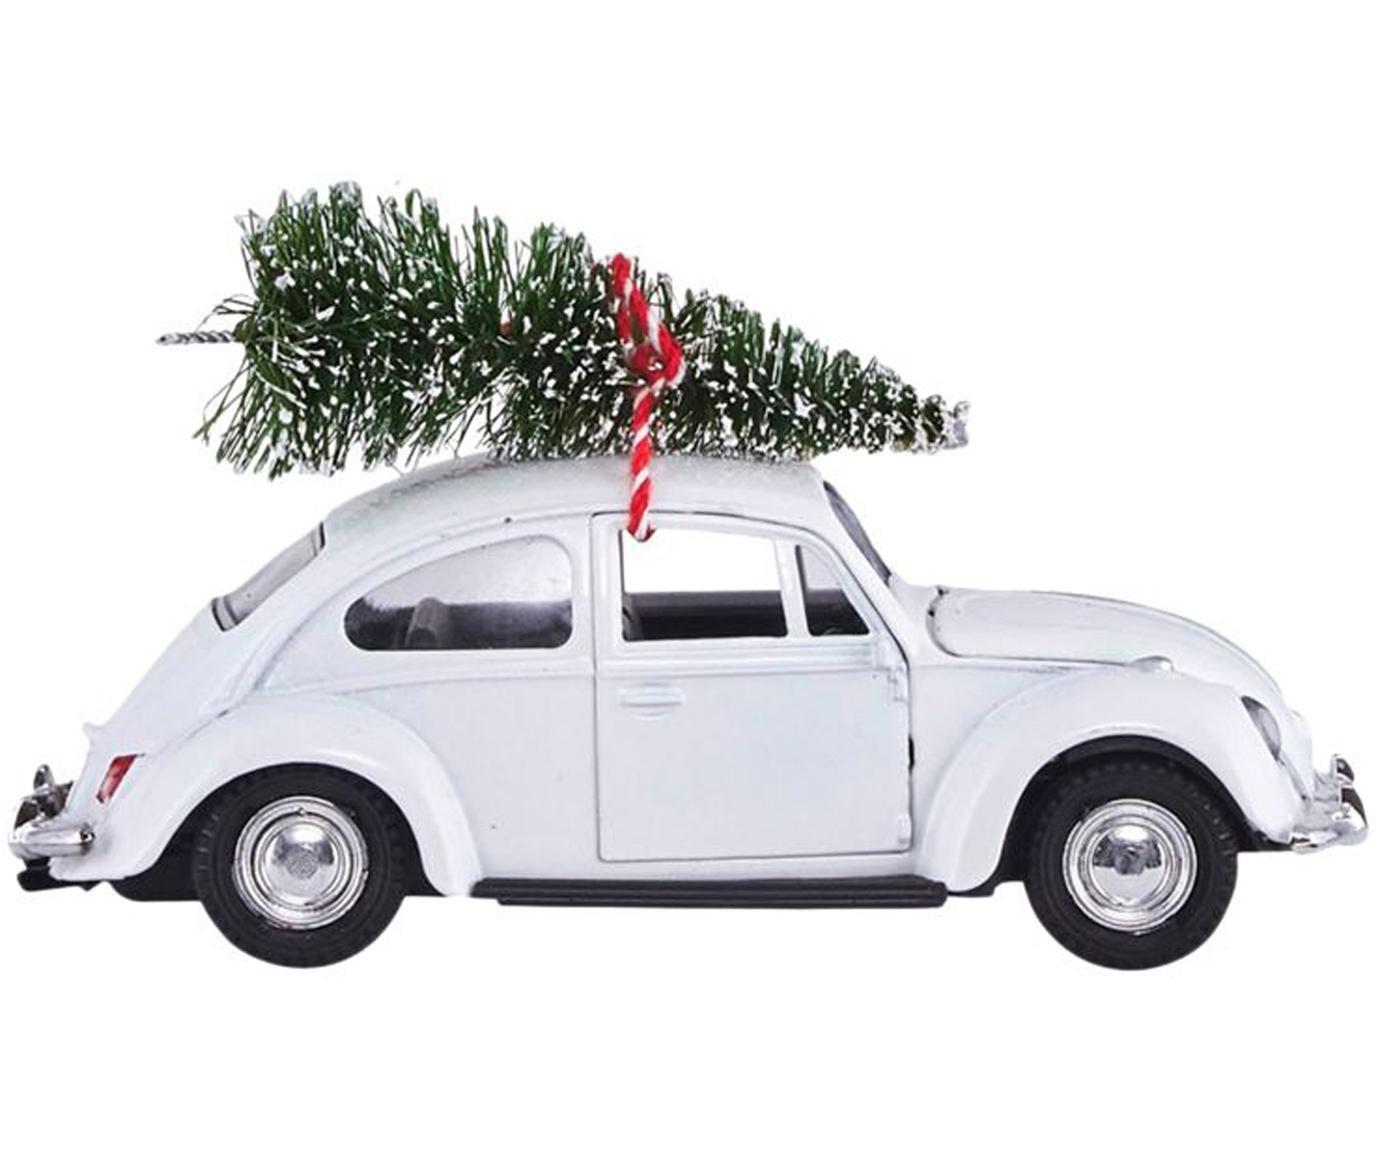 Deko-Objekt Tree Delivery, Zink, Plastik, Weiß, Rot, Grün, 5 x 7 cm